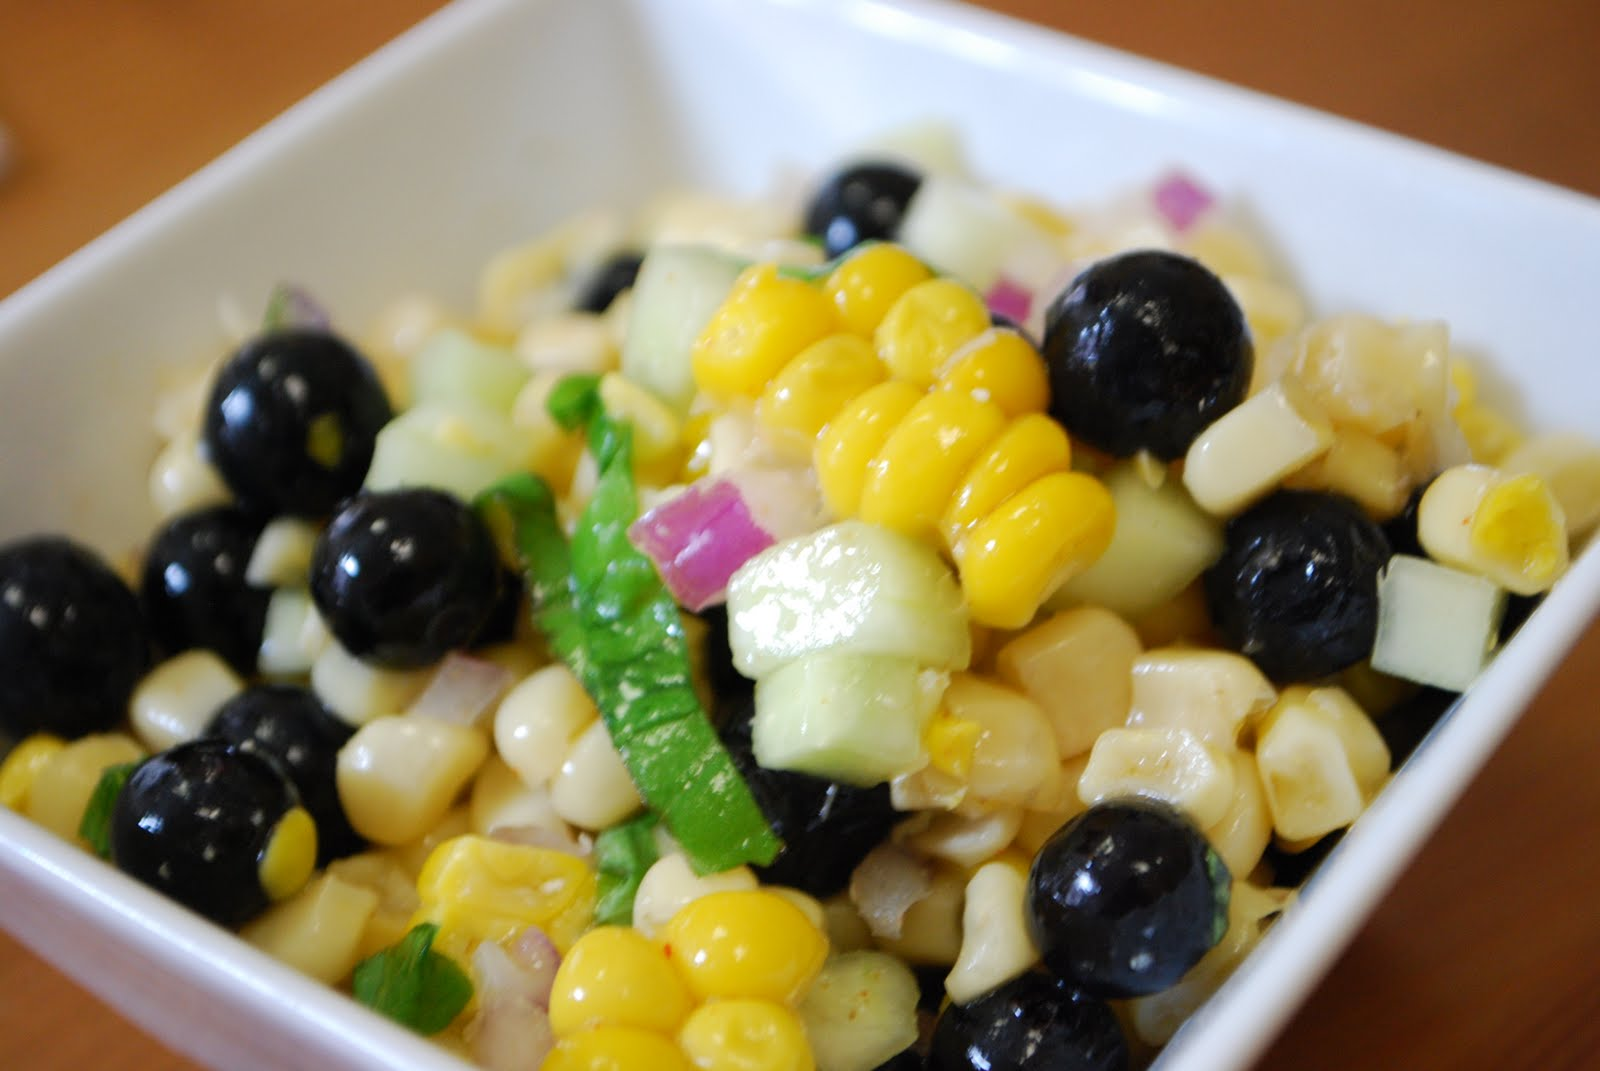 Simply Mangerchine: Blueberry Corn Salad